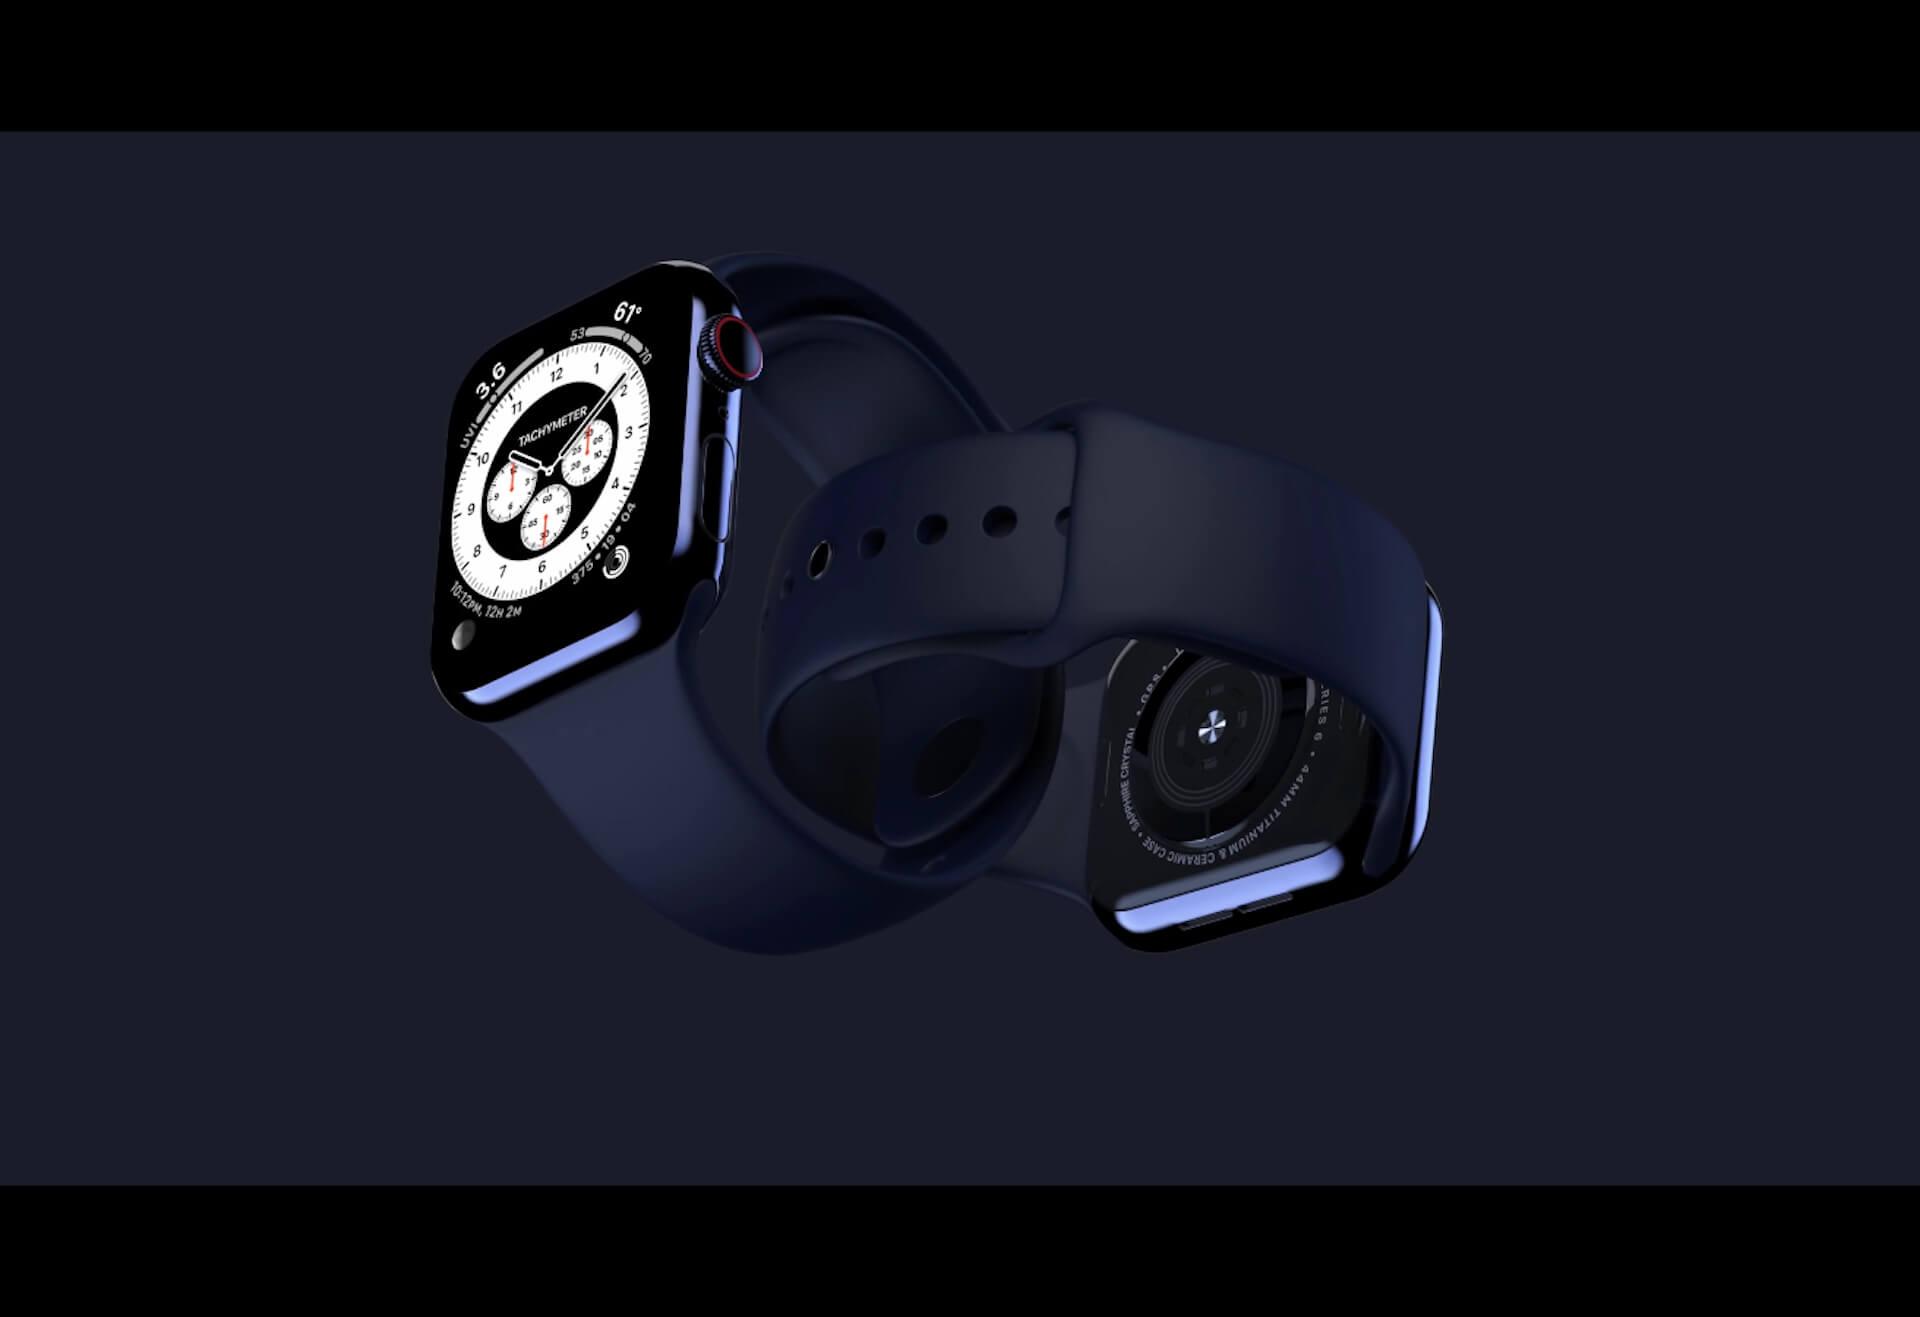 Apple Watch Series 6にはやはり新色追加?急速充電にも対応の可能性 tech200914_applewatch_color_main